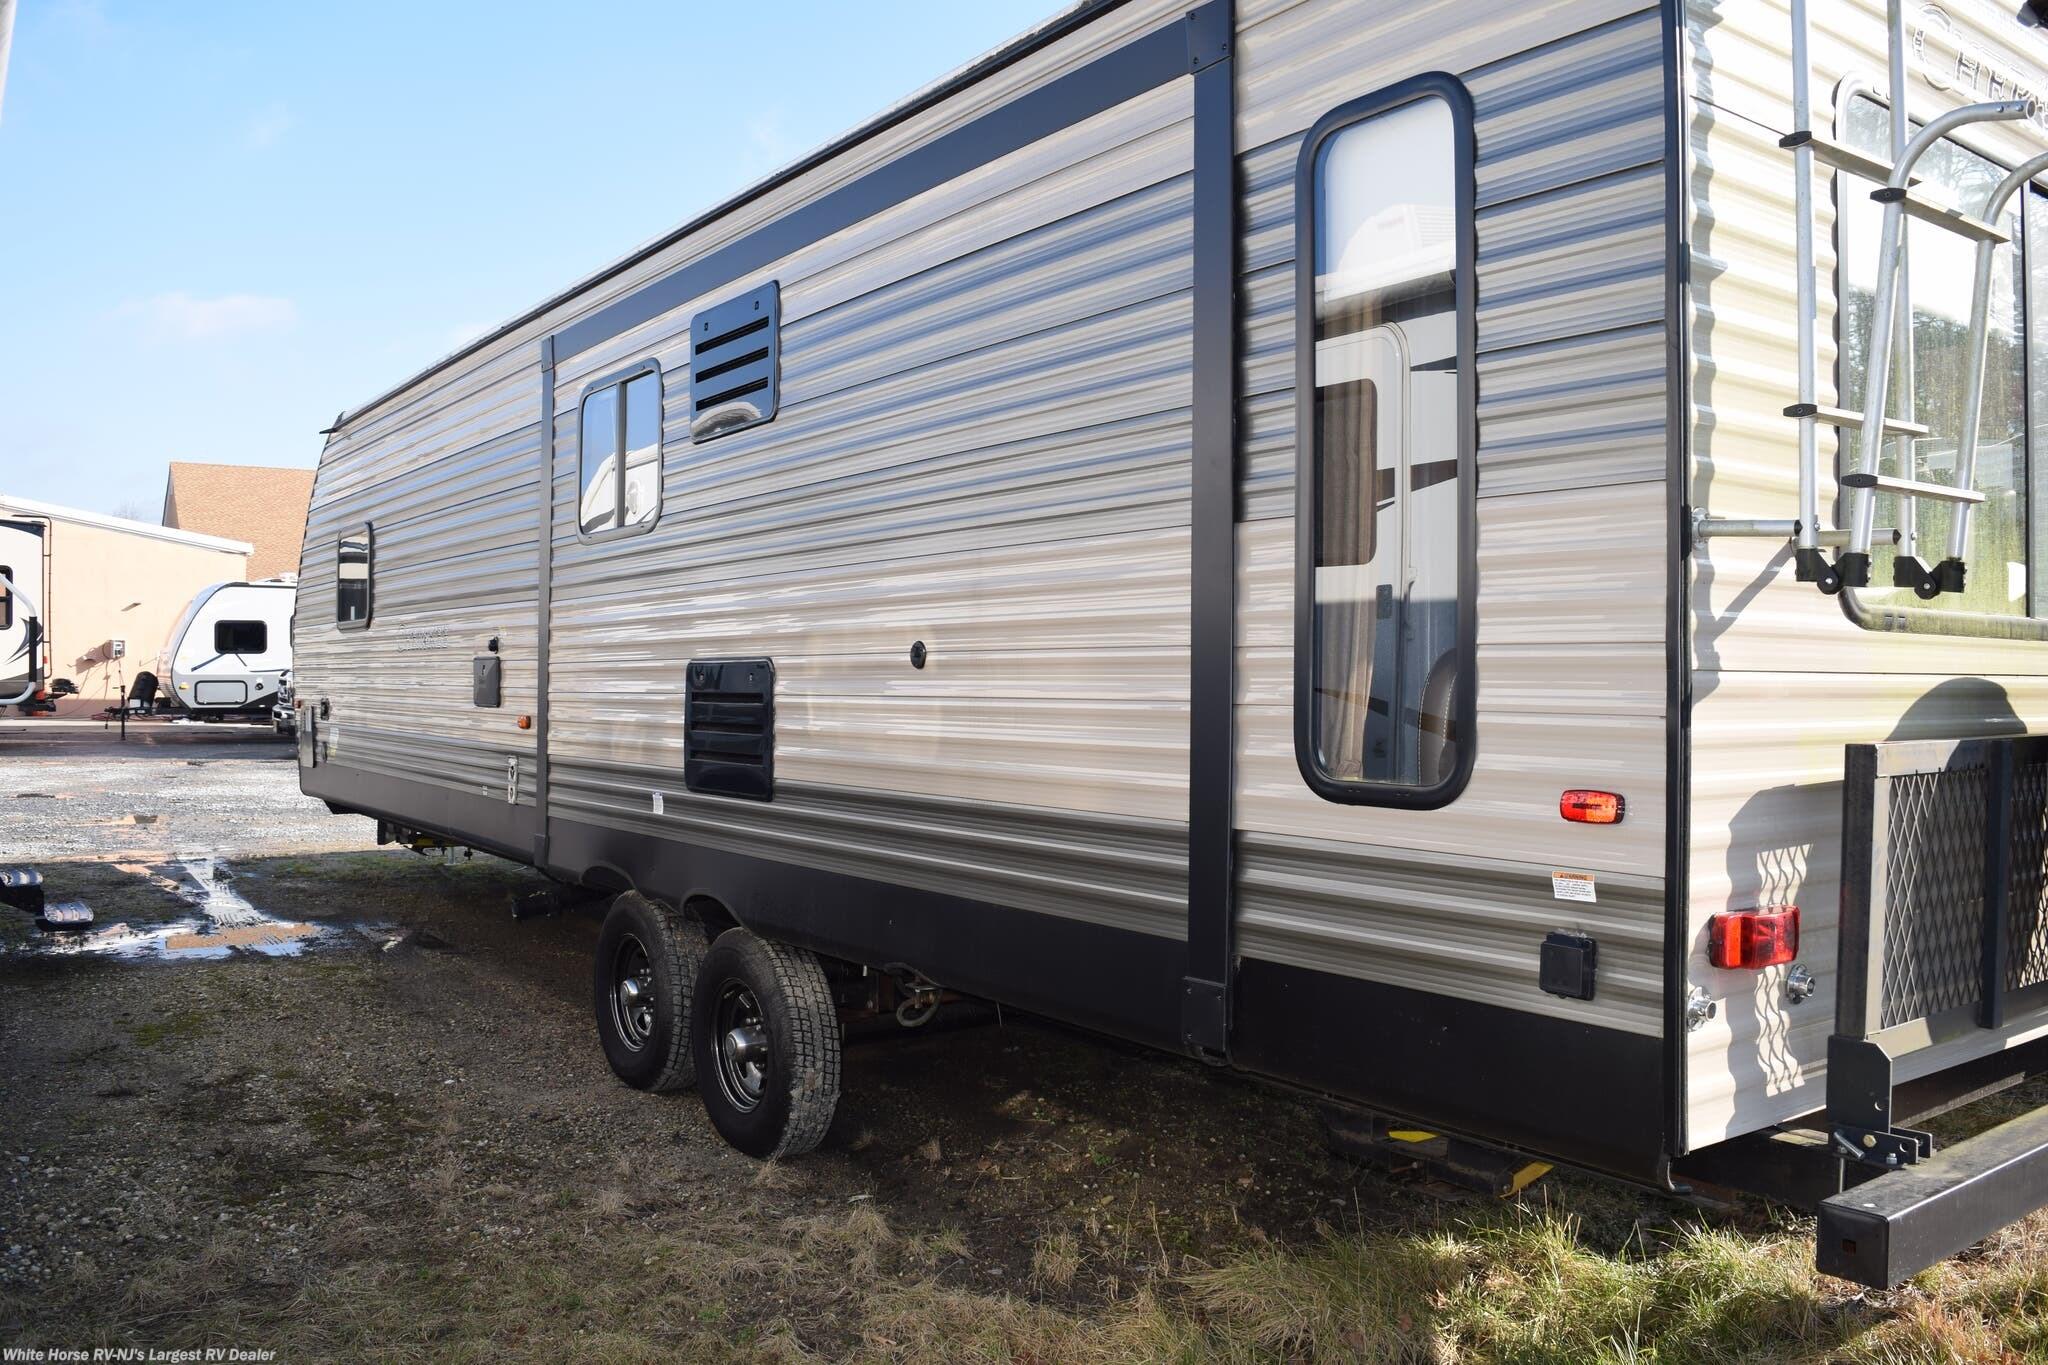 2018 Forest River Cherokee 304r Rv For Sale In Egg Harbor City Nj 08215 Tt3170 Rvusa Com Classifieds